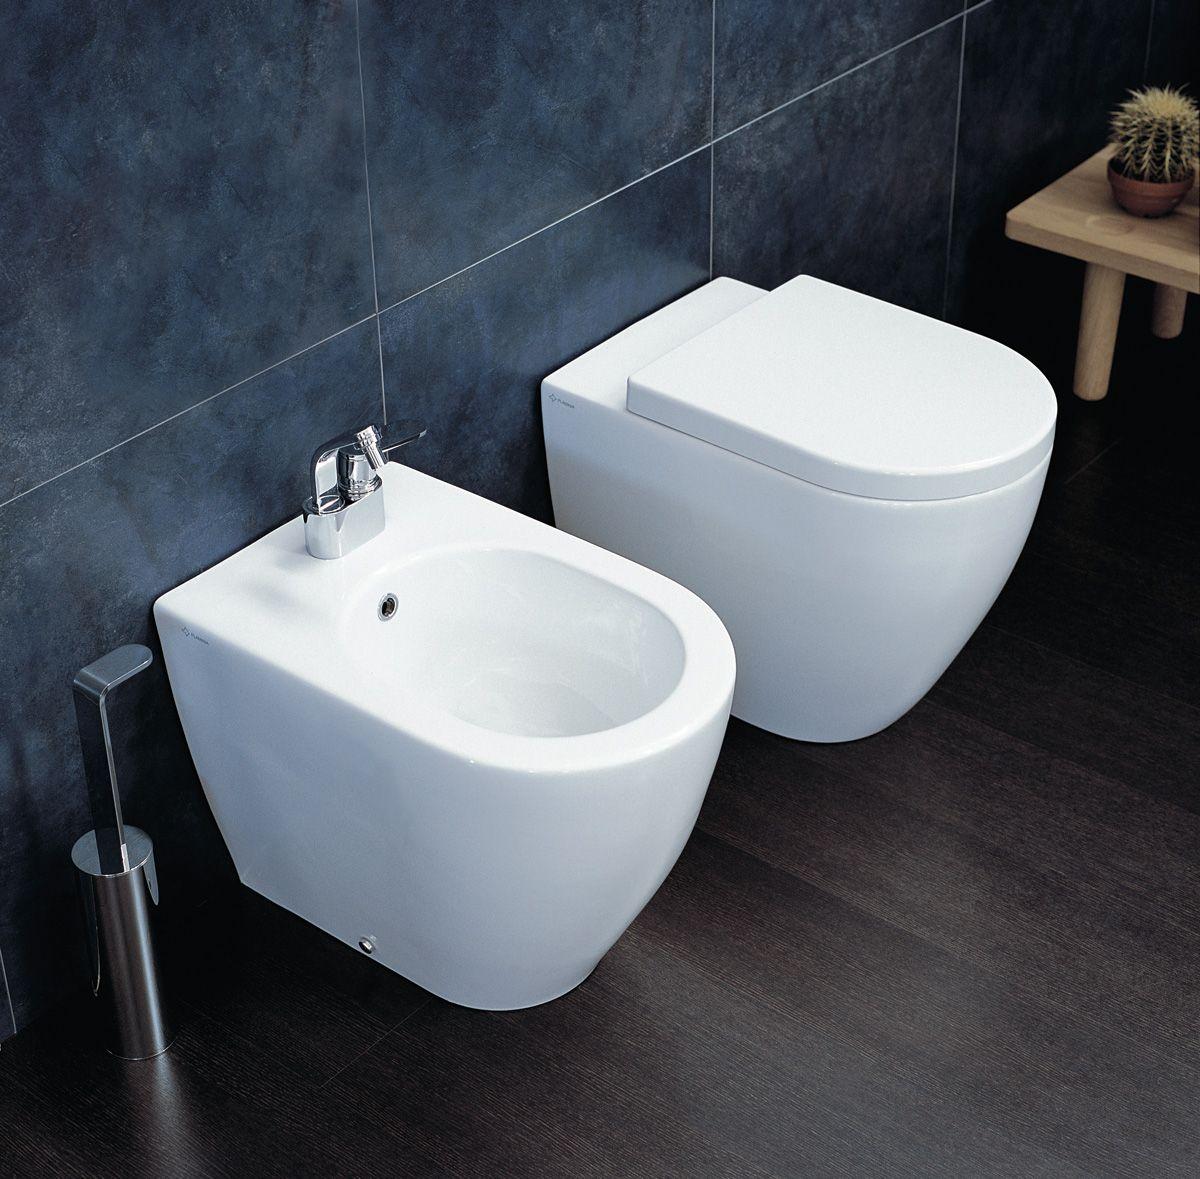 Ceramica Flaminia | 103 - RA | Pinterest | Sweet house, Bath and House